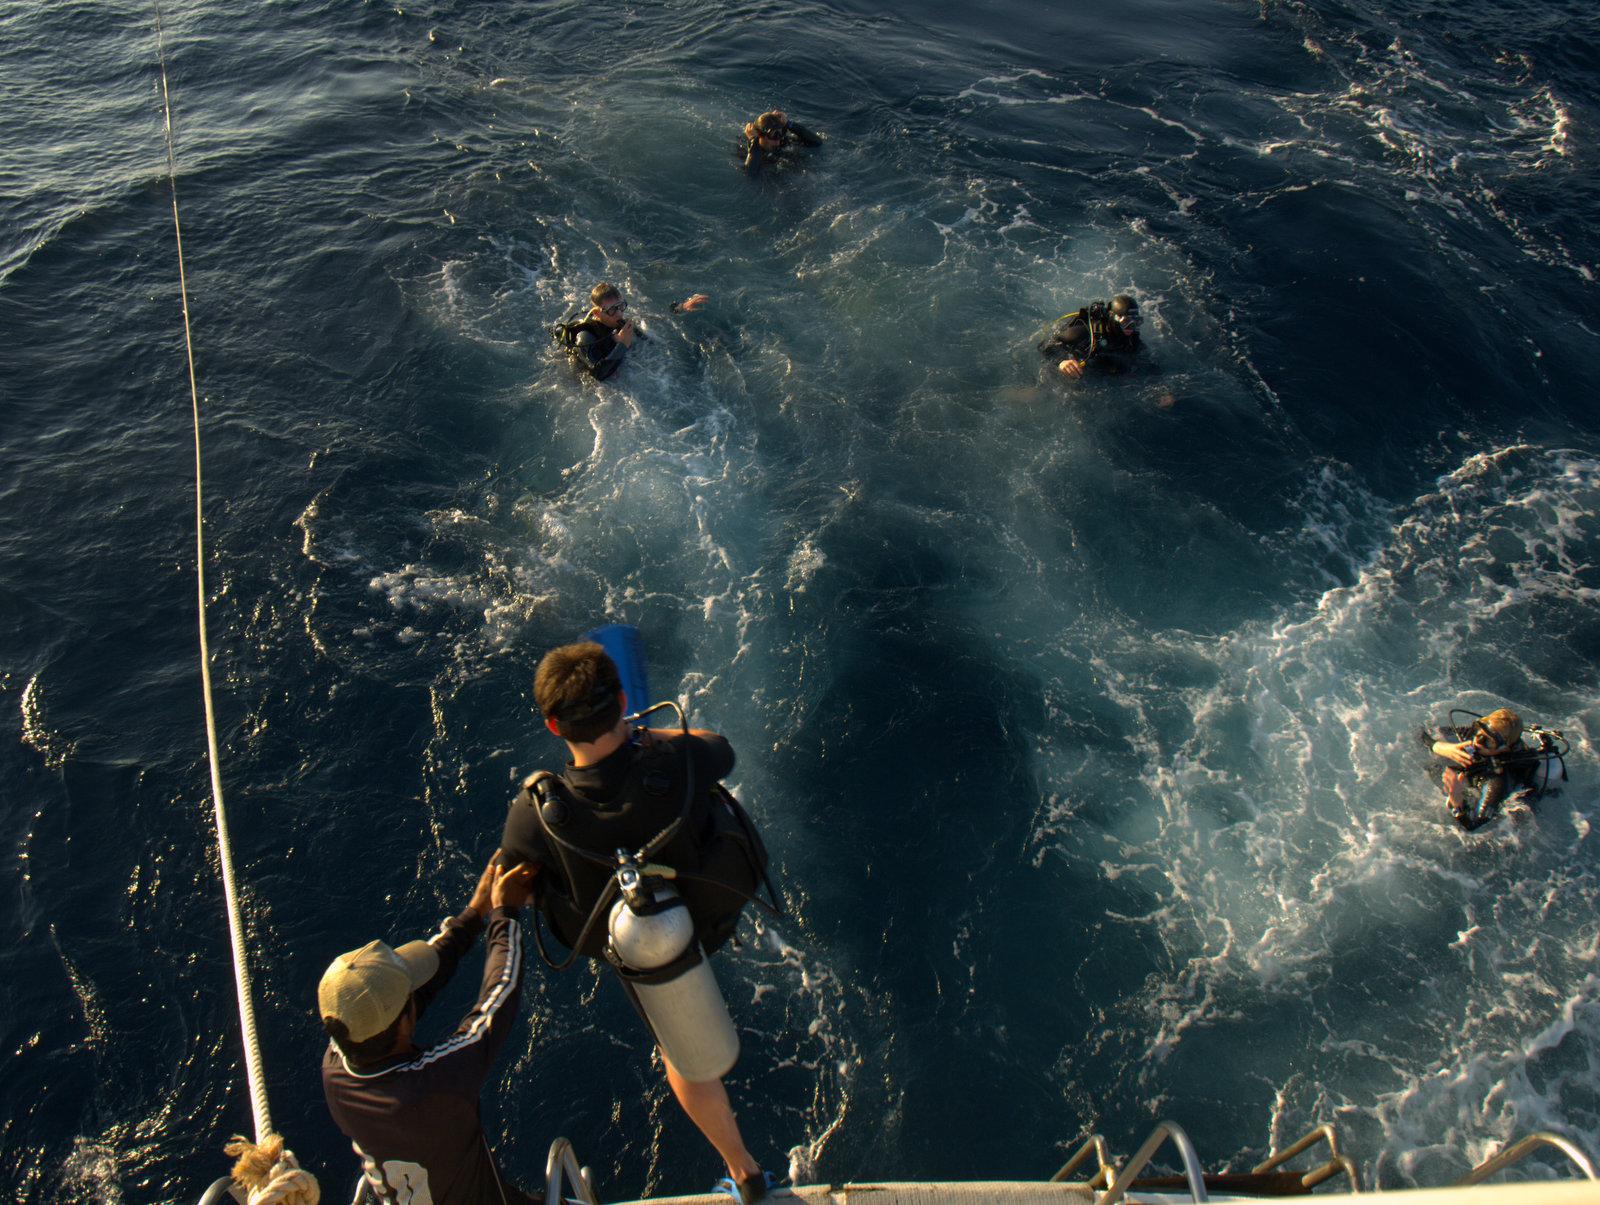 Ned i det dybe hav